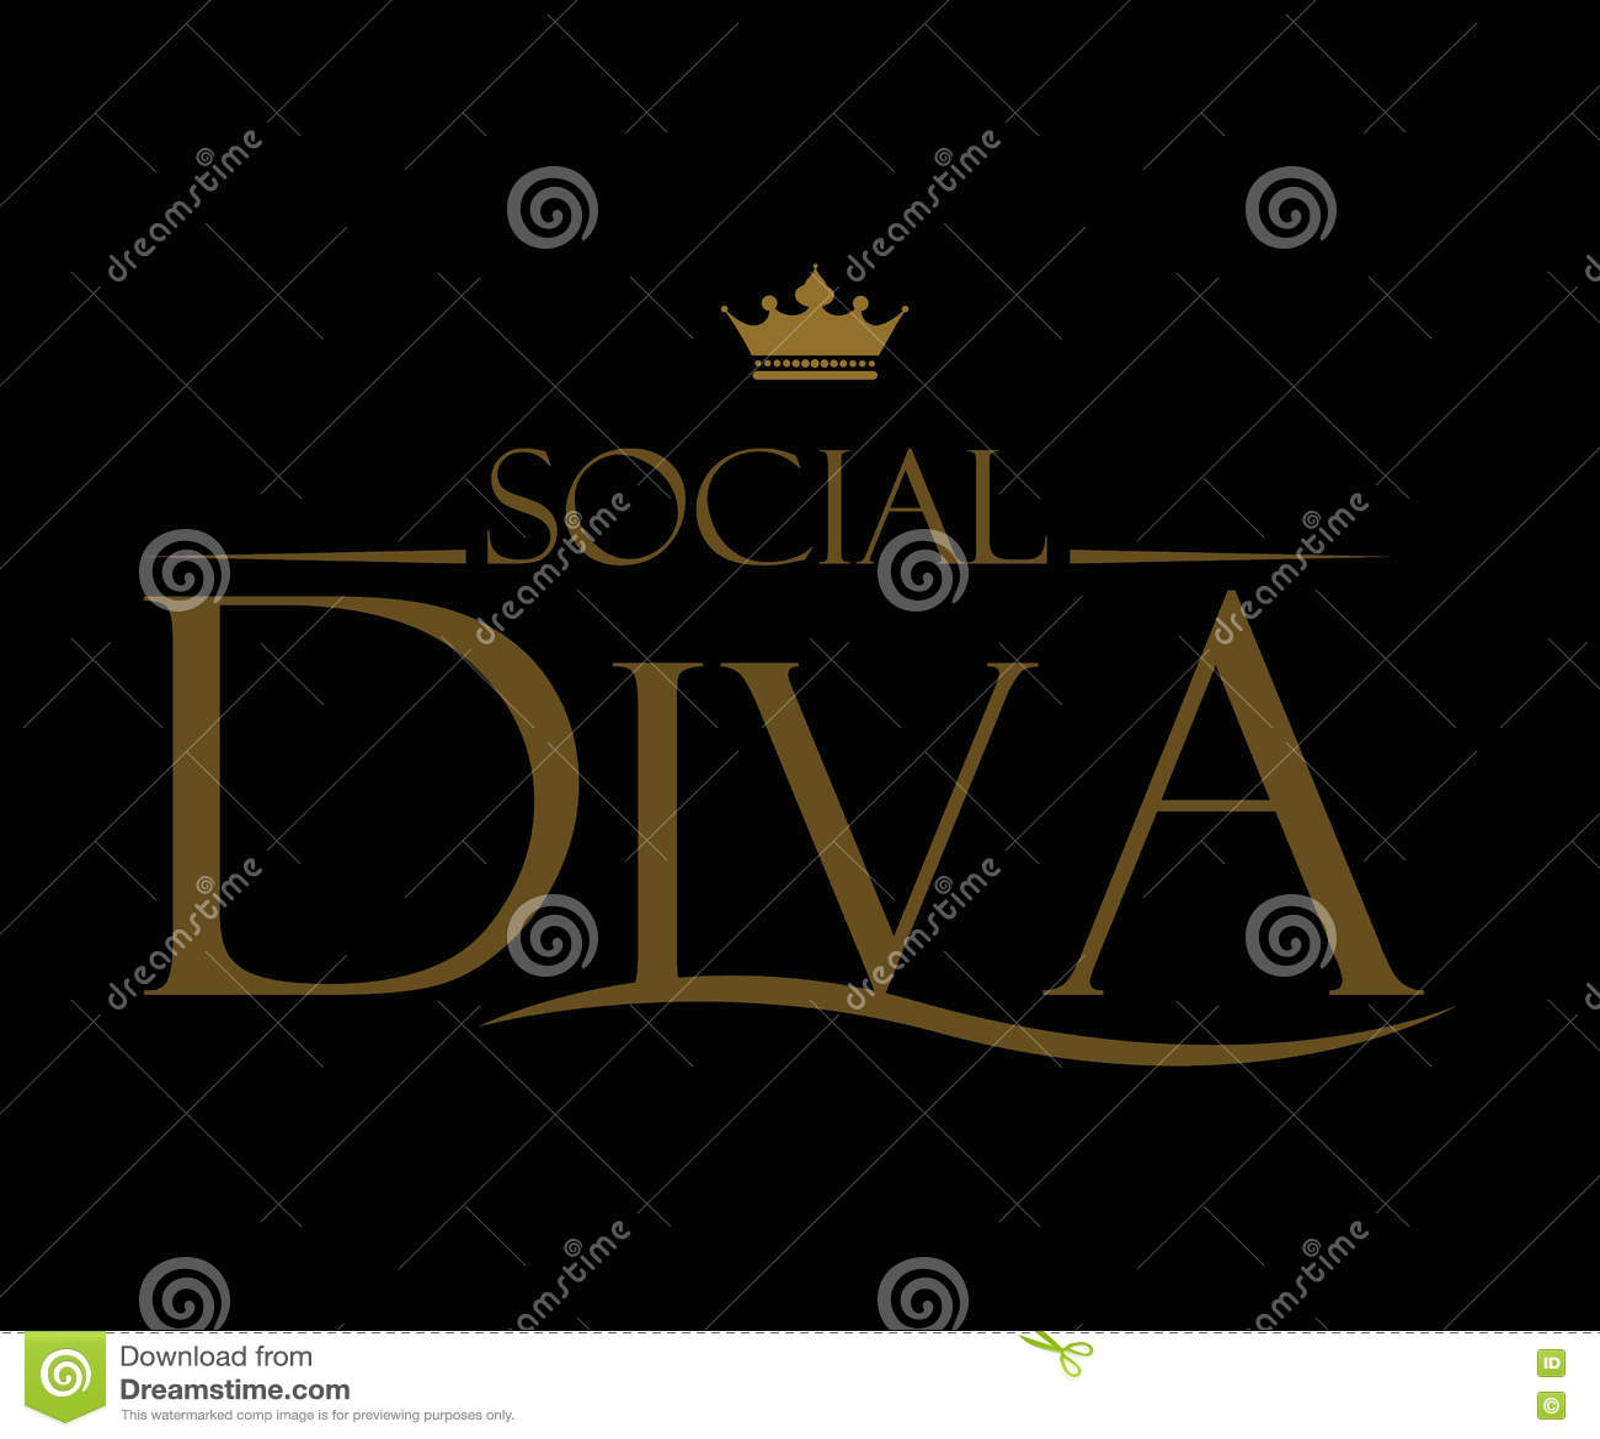 Progressive Logo Design For You Choose The Text Style To: Diva Logo Design Cartoon Vector